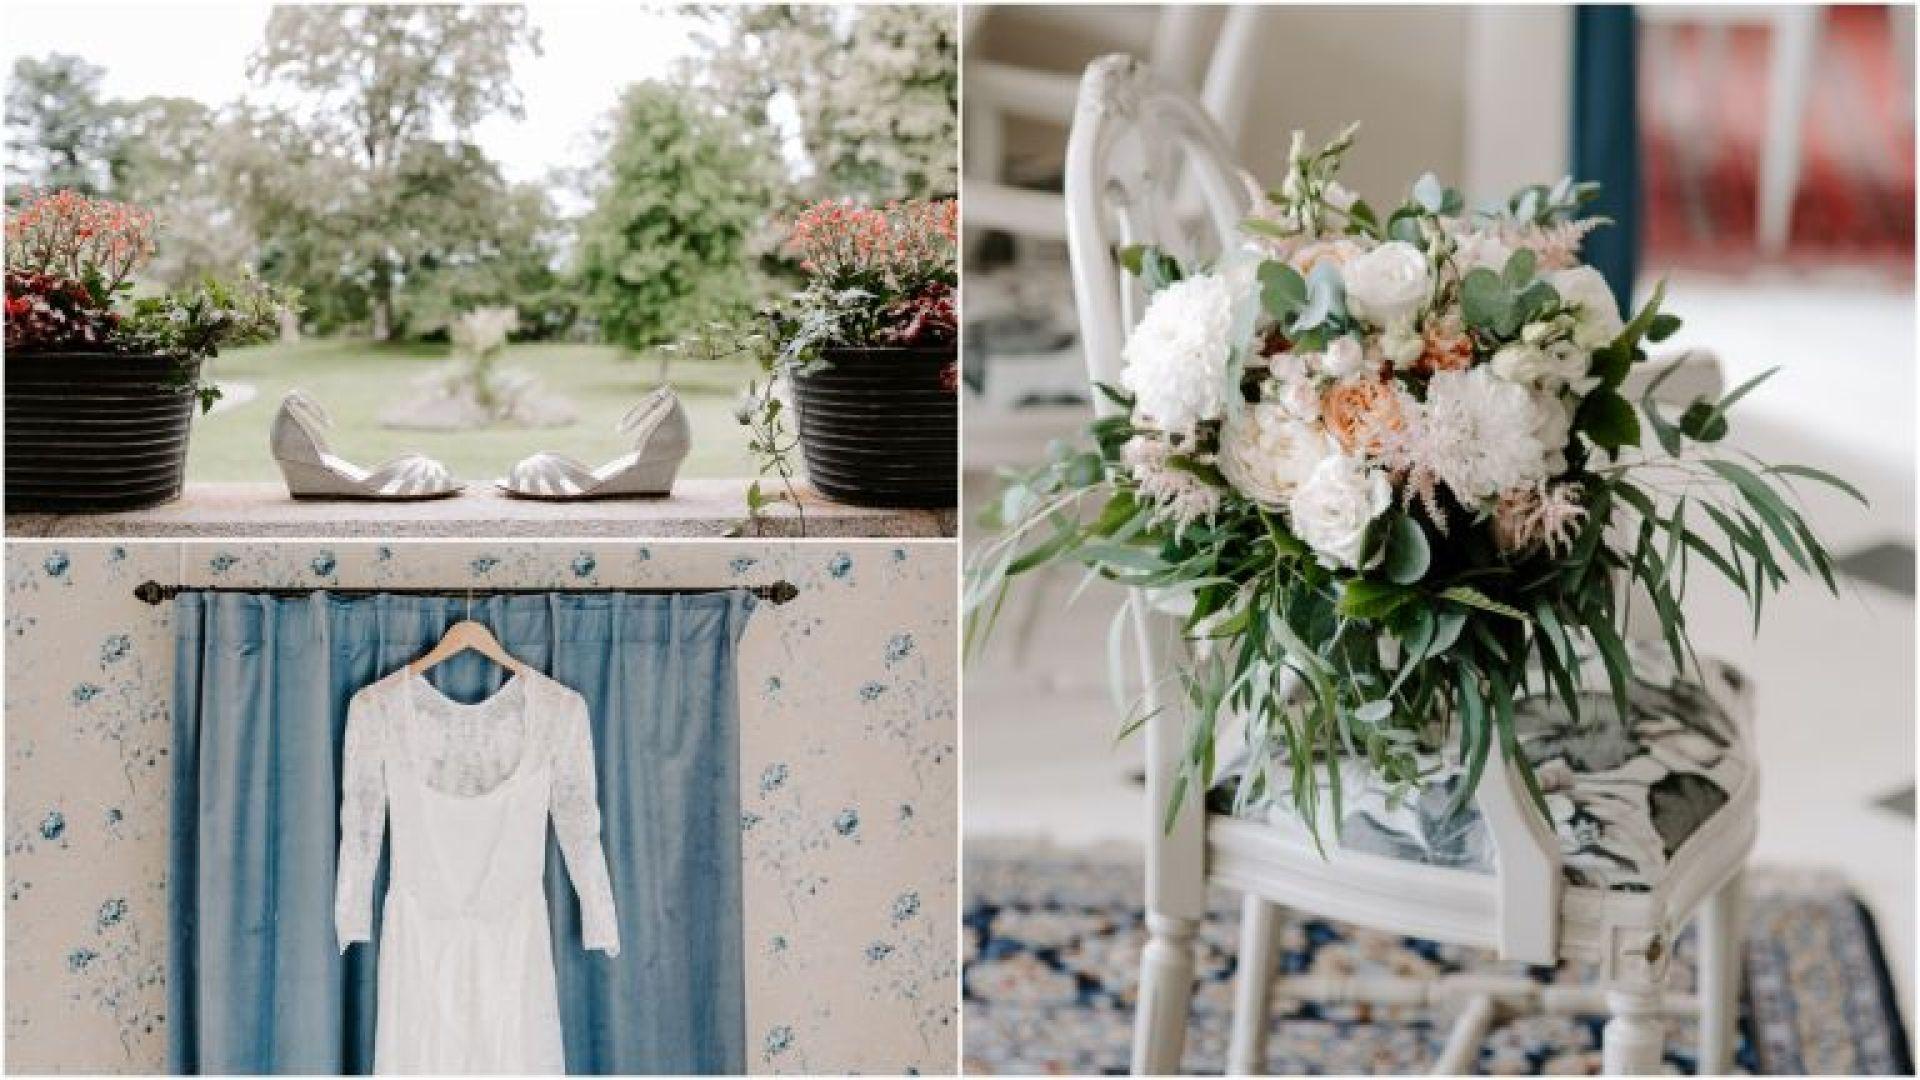 Bridal details at Baldersnas Herrgard wedding venue